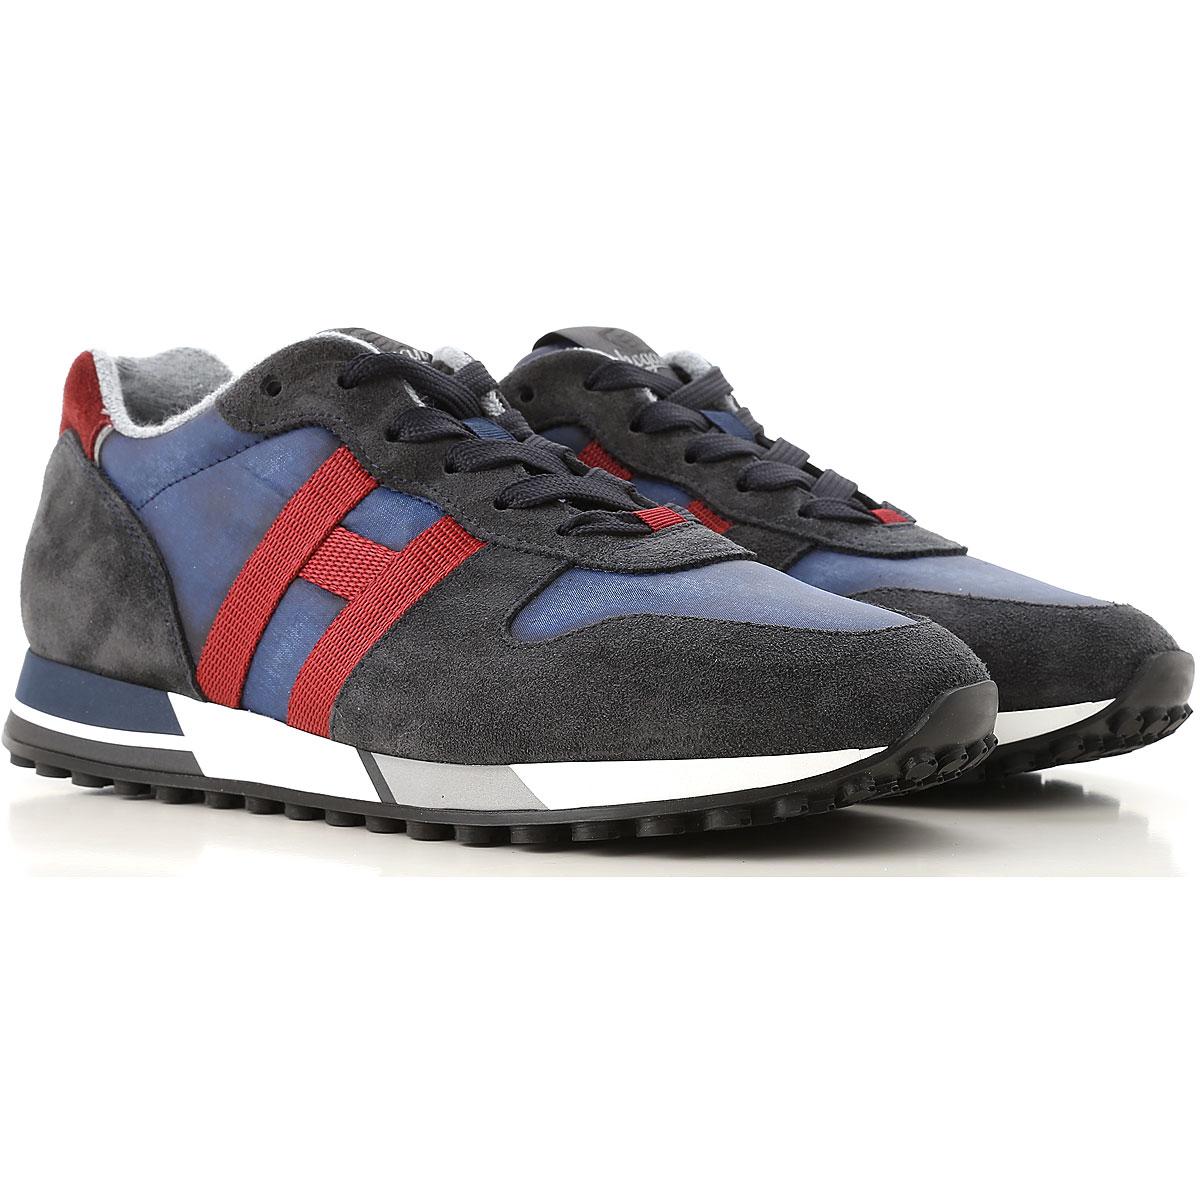 698cca515b Mens Shoes Hogan, Style code: hxm3830an50jhl6eea--